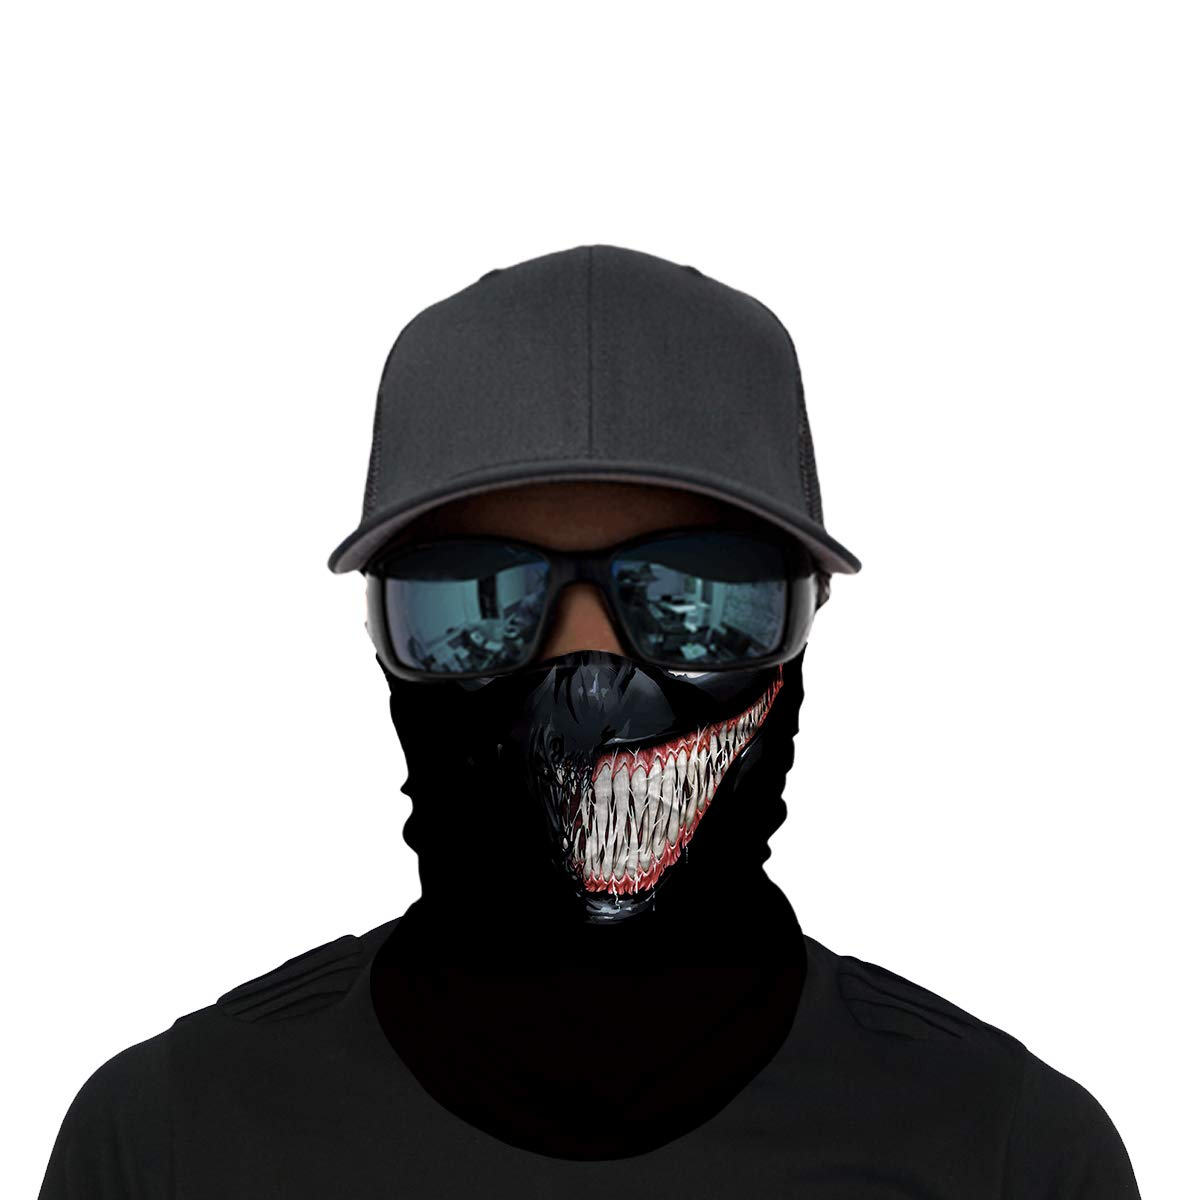 OUYZY Neck Gaiter Fishing Headband for Cycling Bandana Skateboarding Face Sun Mask Headwear Motorcycling Moisture Wicking UV Protection Running Magic Scarf Balaclava